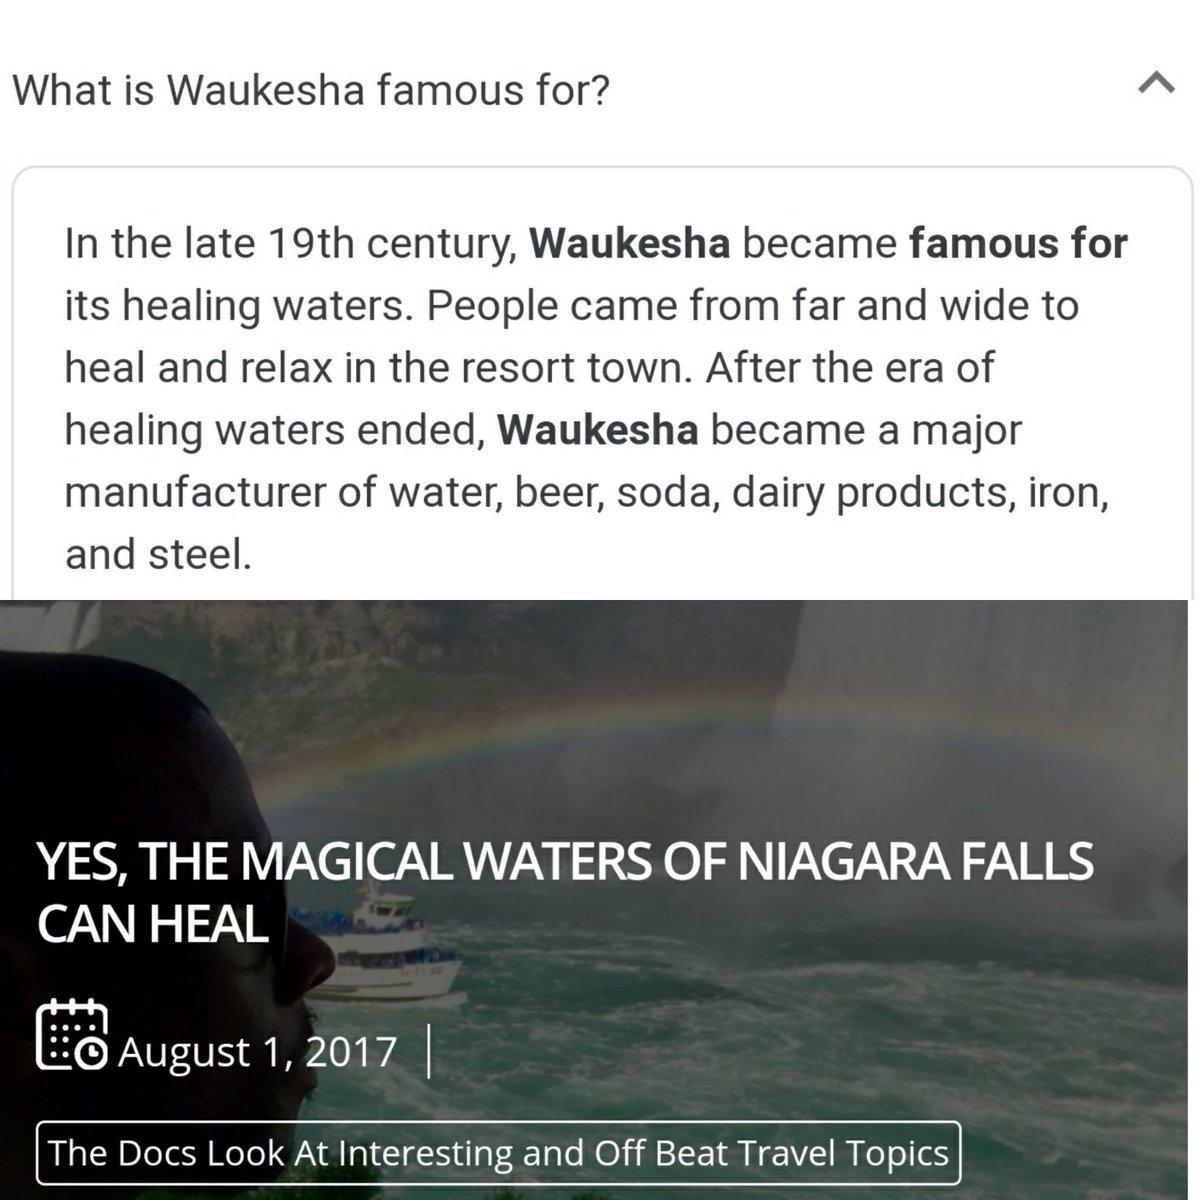 Okay #BillsMafia. Y'all ain't ready for this Watt Watch logic. JJ Watt was born in Waukesha, WI. Niagara Falls is in the backyard of Buffalo. Look at what they both have in common. Yes, I'm in the rabbit hole now. @JJWatt #billsbyabillion